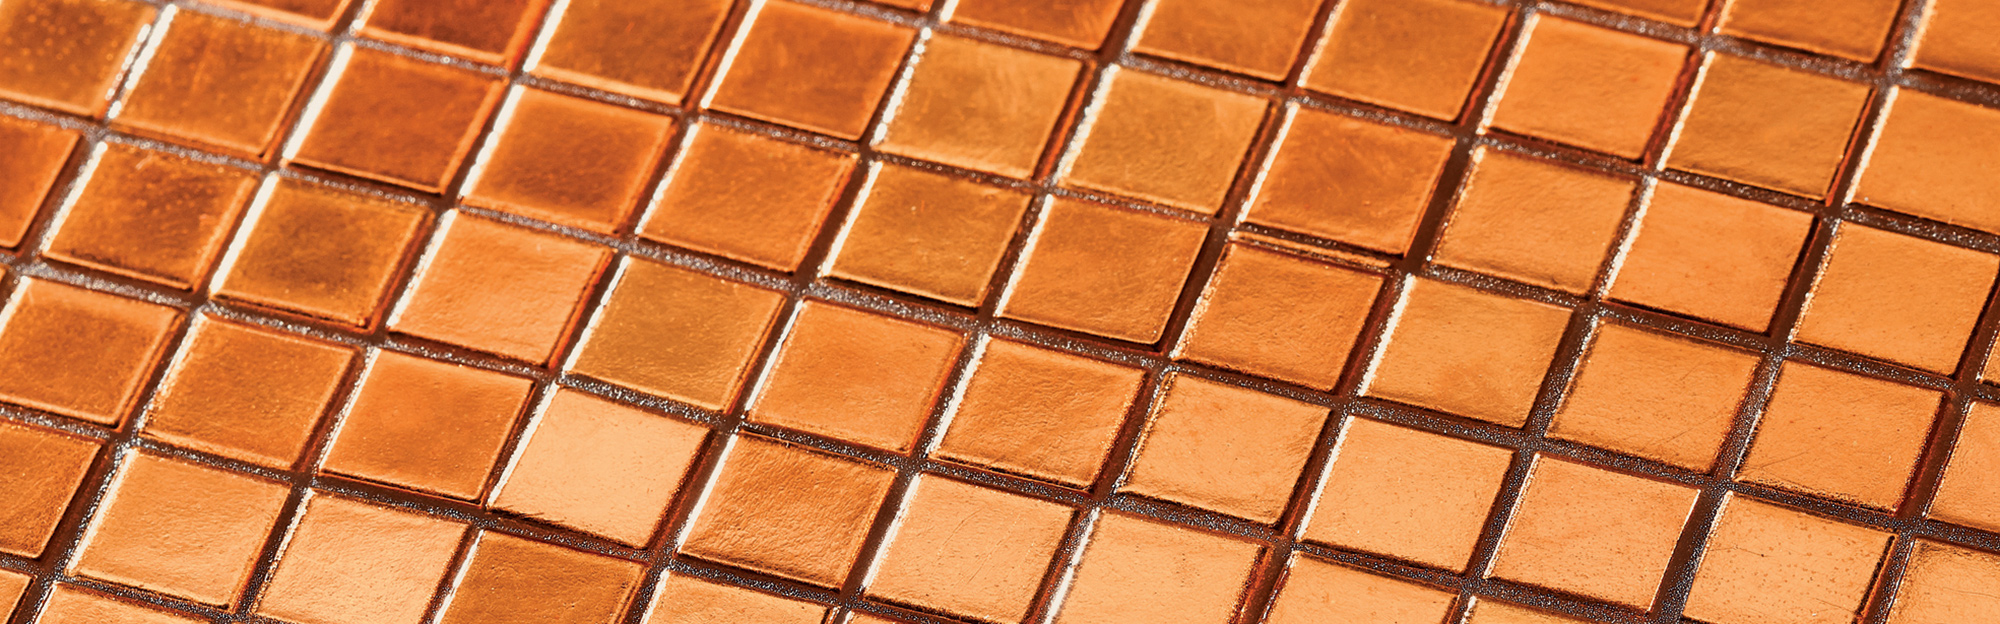 Bisazza Rose Gold Mosaic Tiles